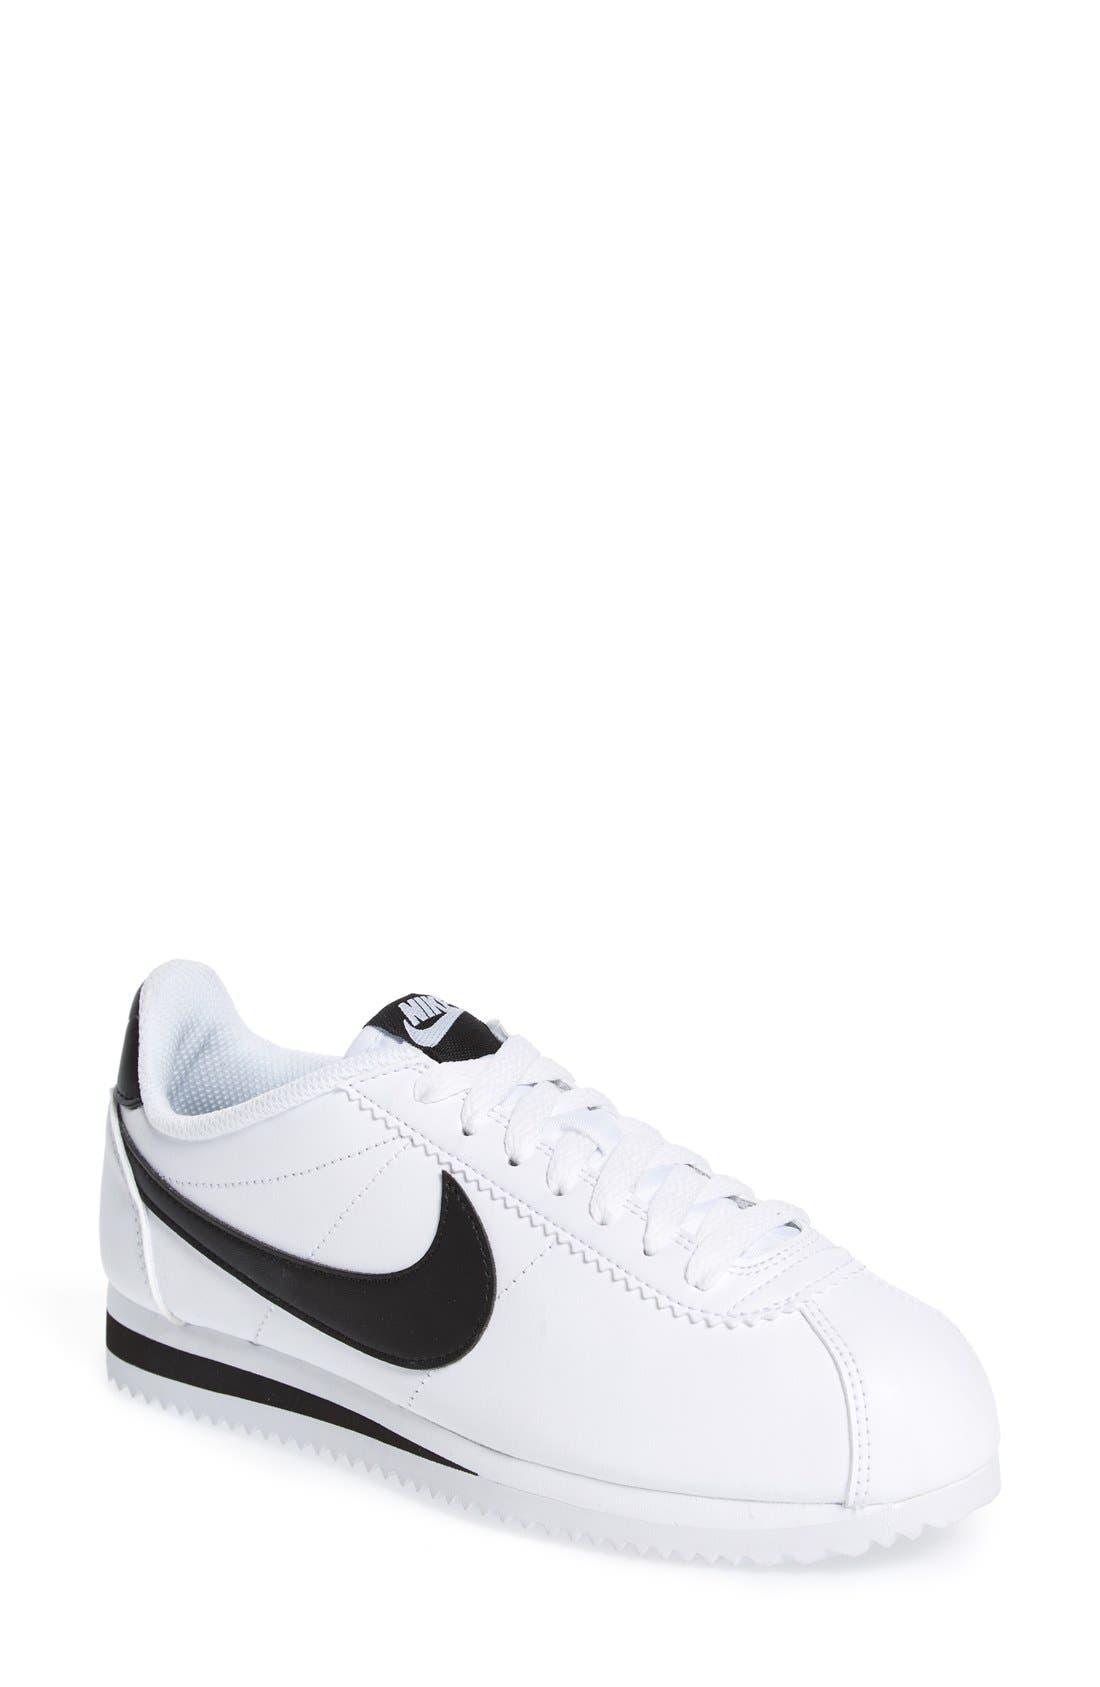 Alternate Image 1 Selected - Nike 'Classic Cortez' Sneaker (Women)